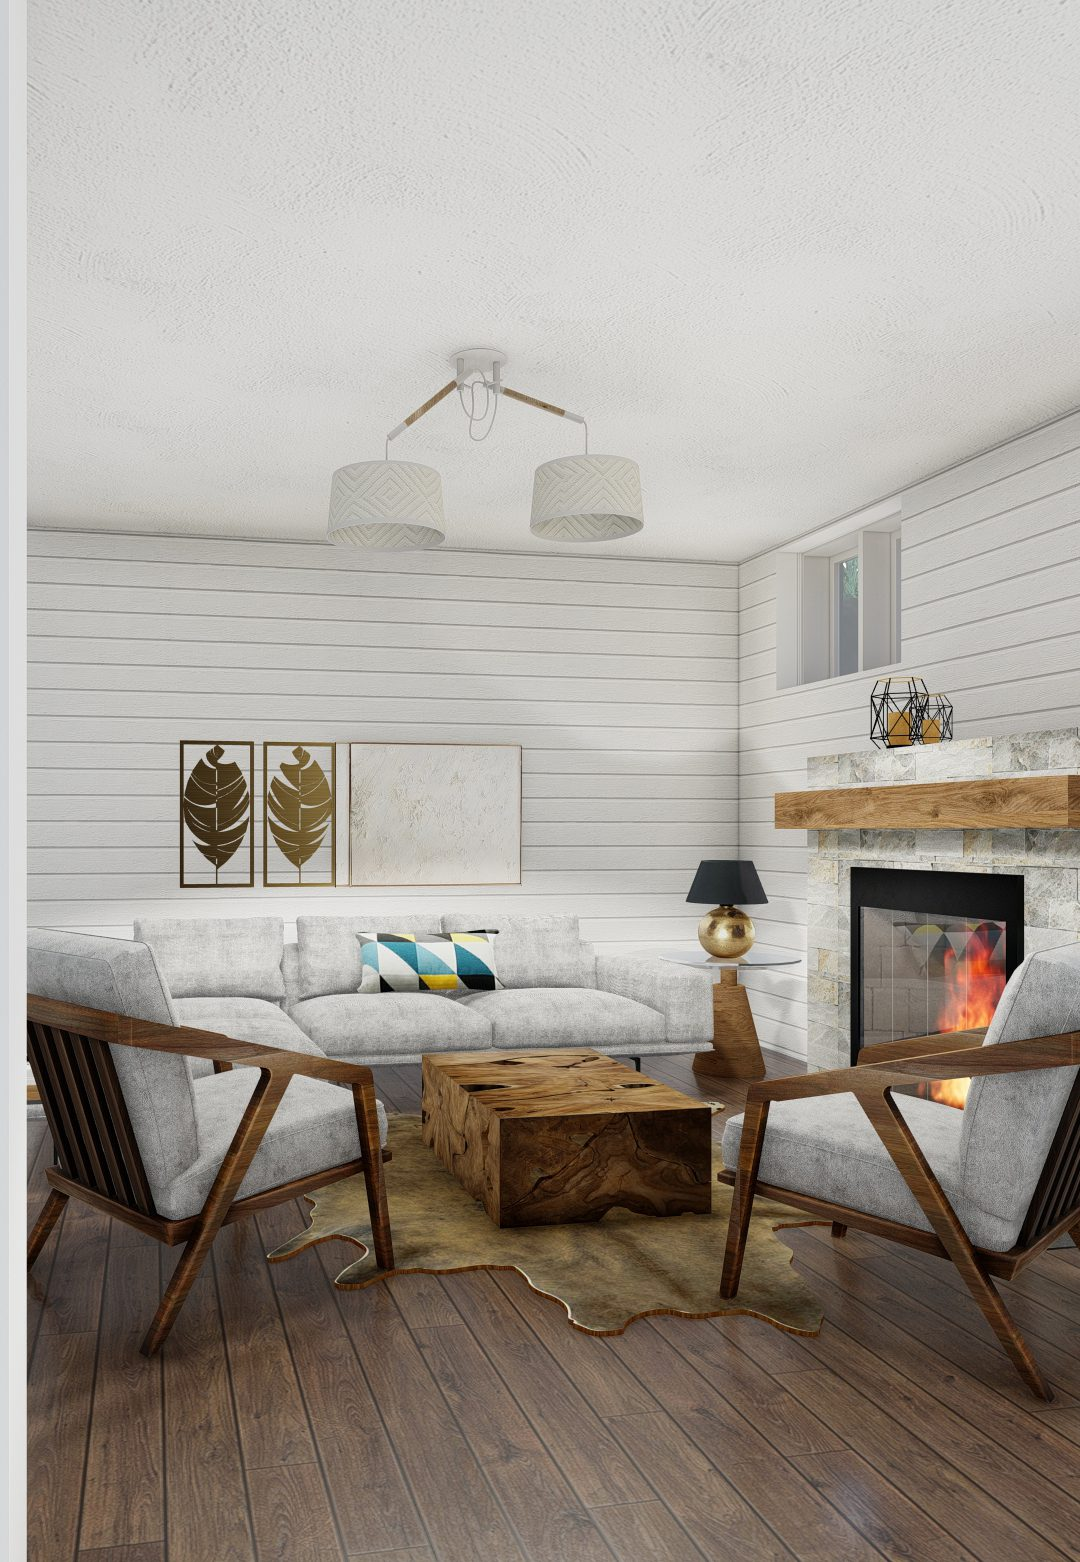 Normerica Timber Homes, Timber Frame, House Plans, The Herridge 3979, Interior, Basement